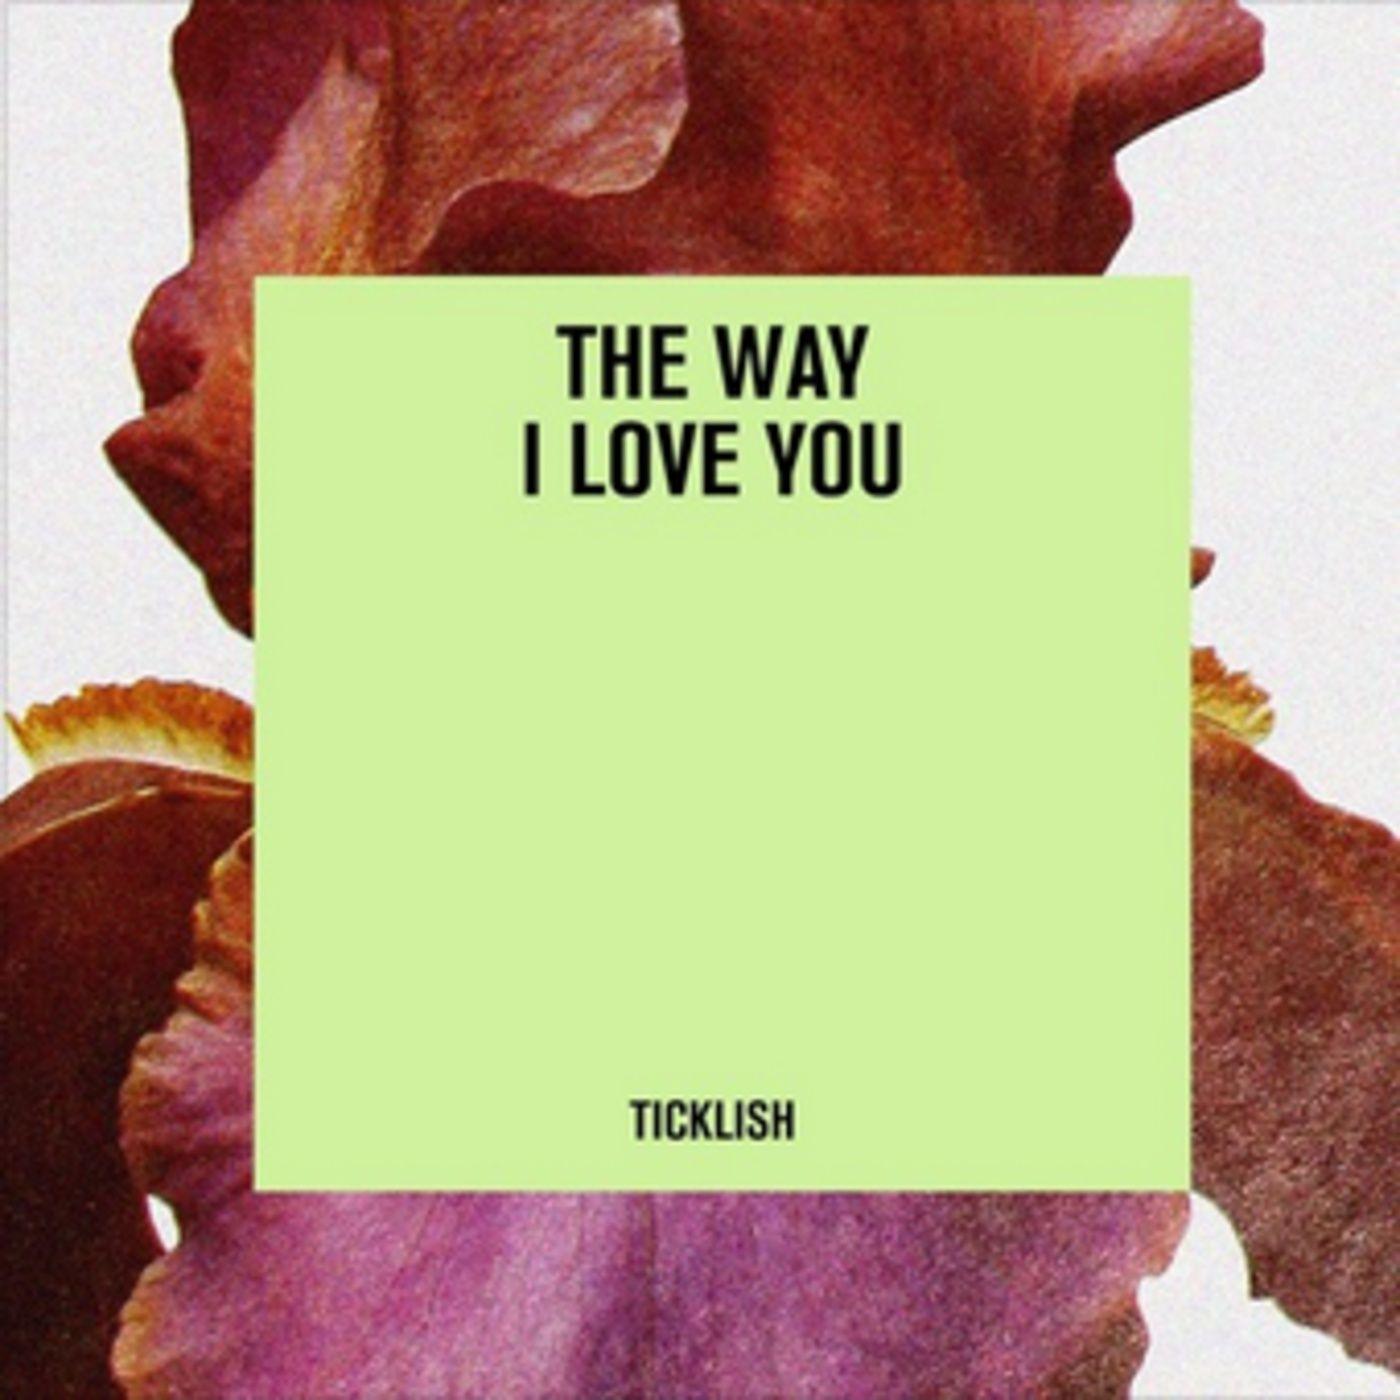 TICKLISH - The Way I Love You